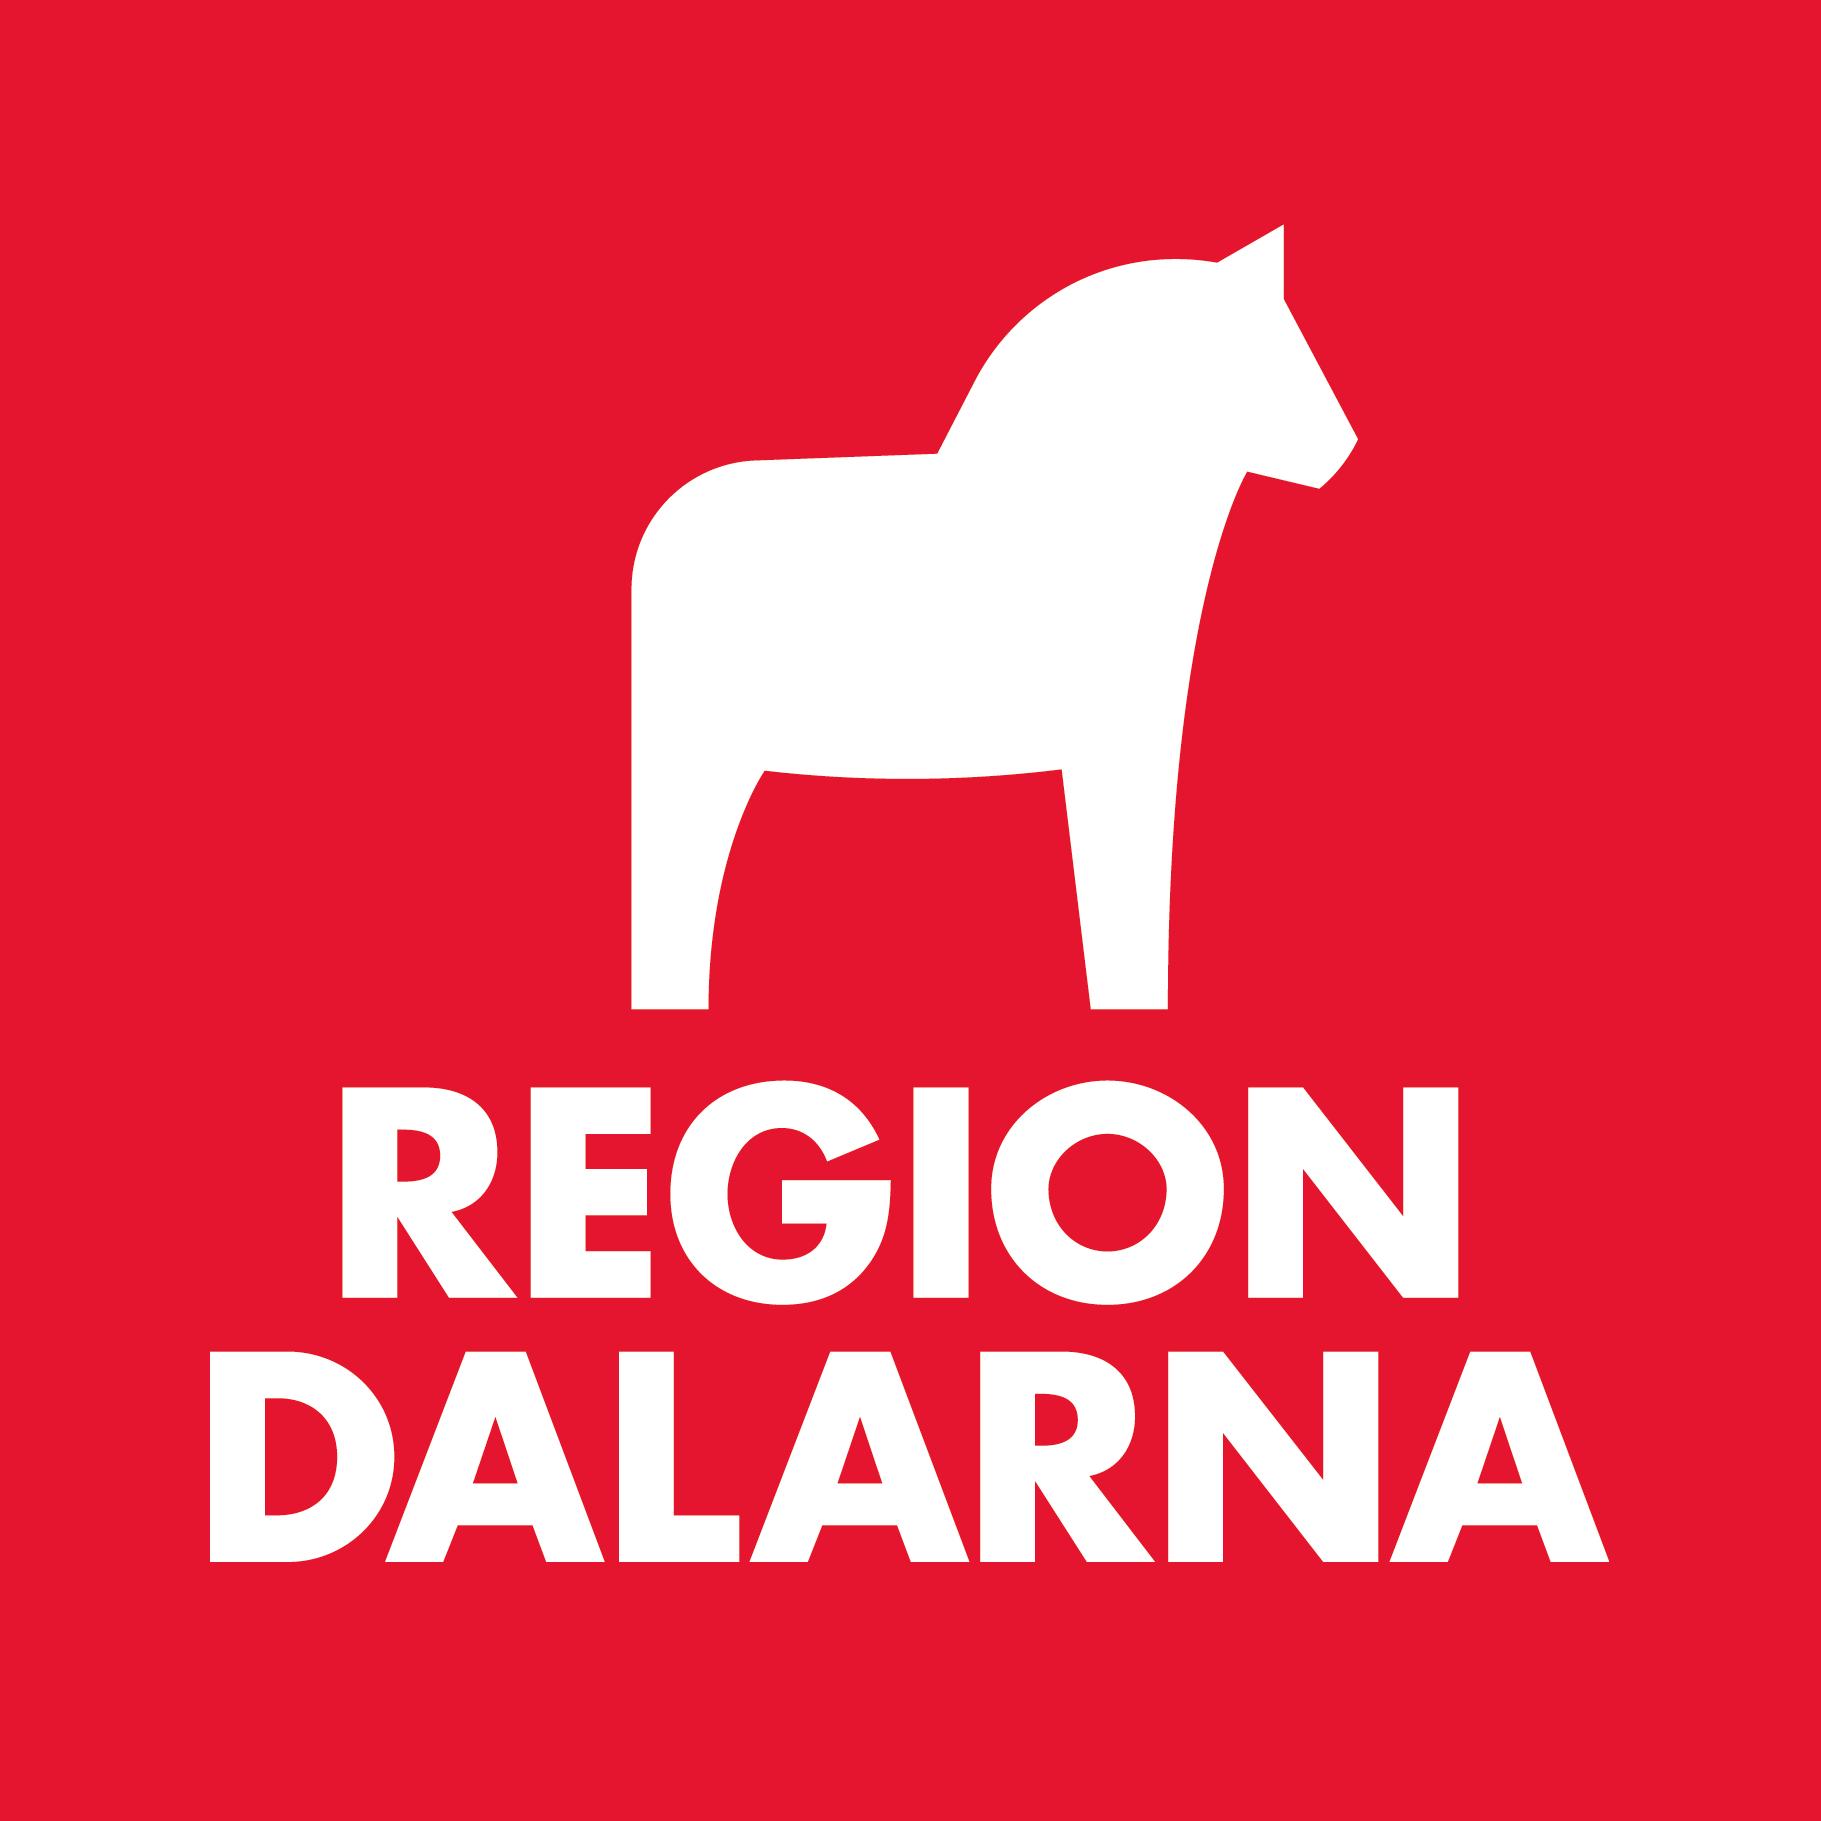 Region Dalarna Logo.